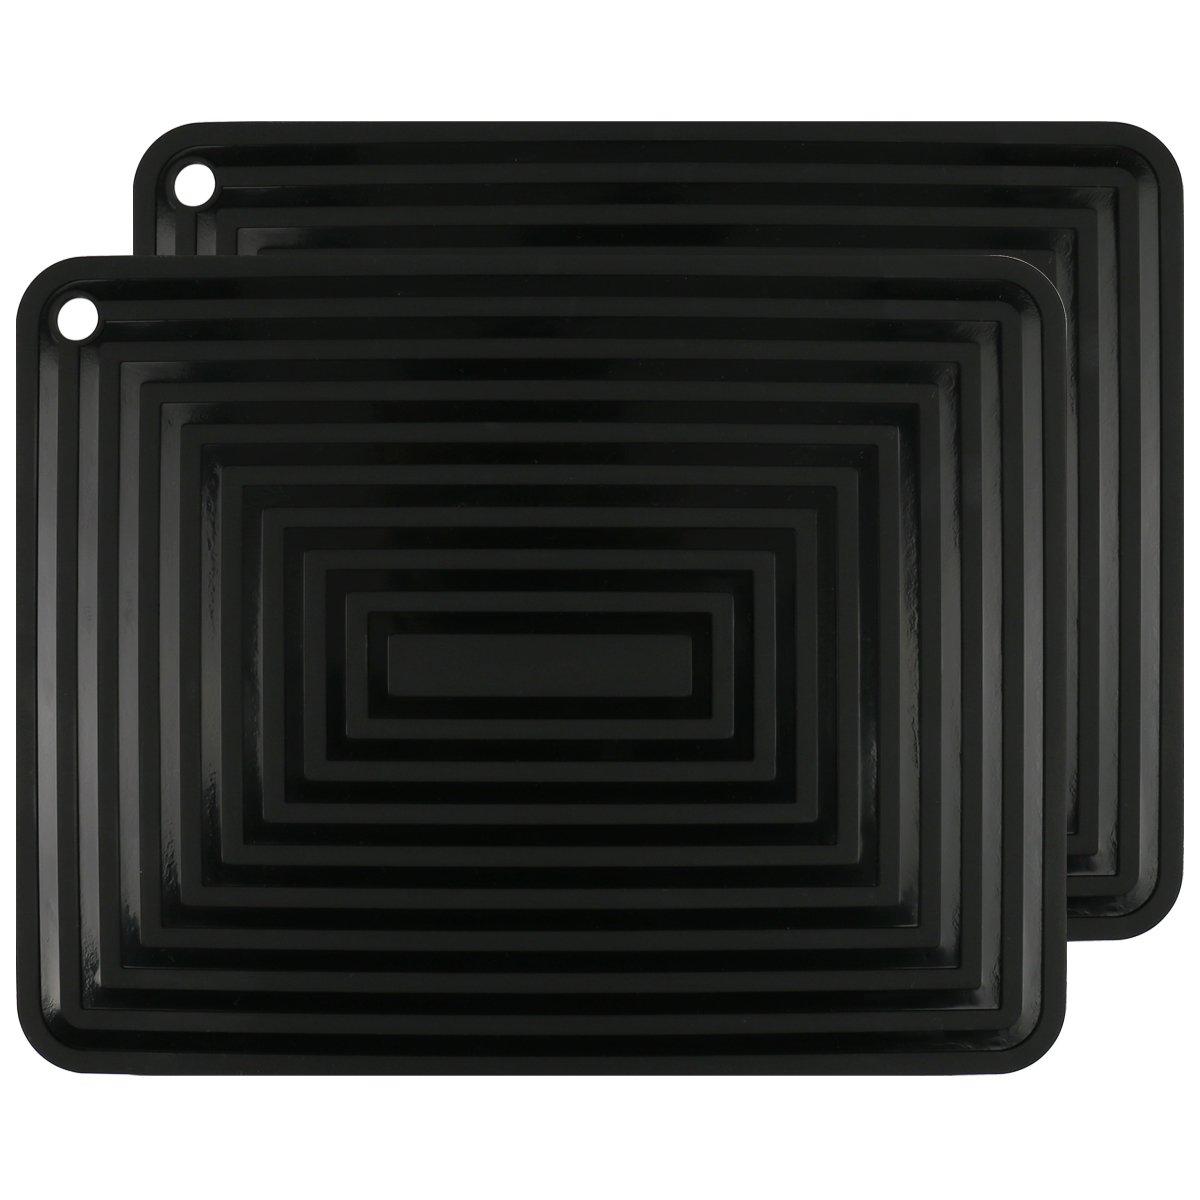 2 Pack,Silicone Trivet Mats/Hot Pads,Pot Holder,9''x12'' Non Slip Flexible Durable Heat Resistant Pot Coaster Kitchen Table Mats (Black)